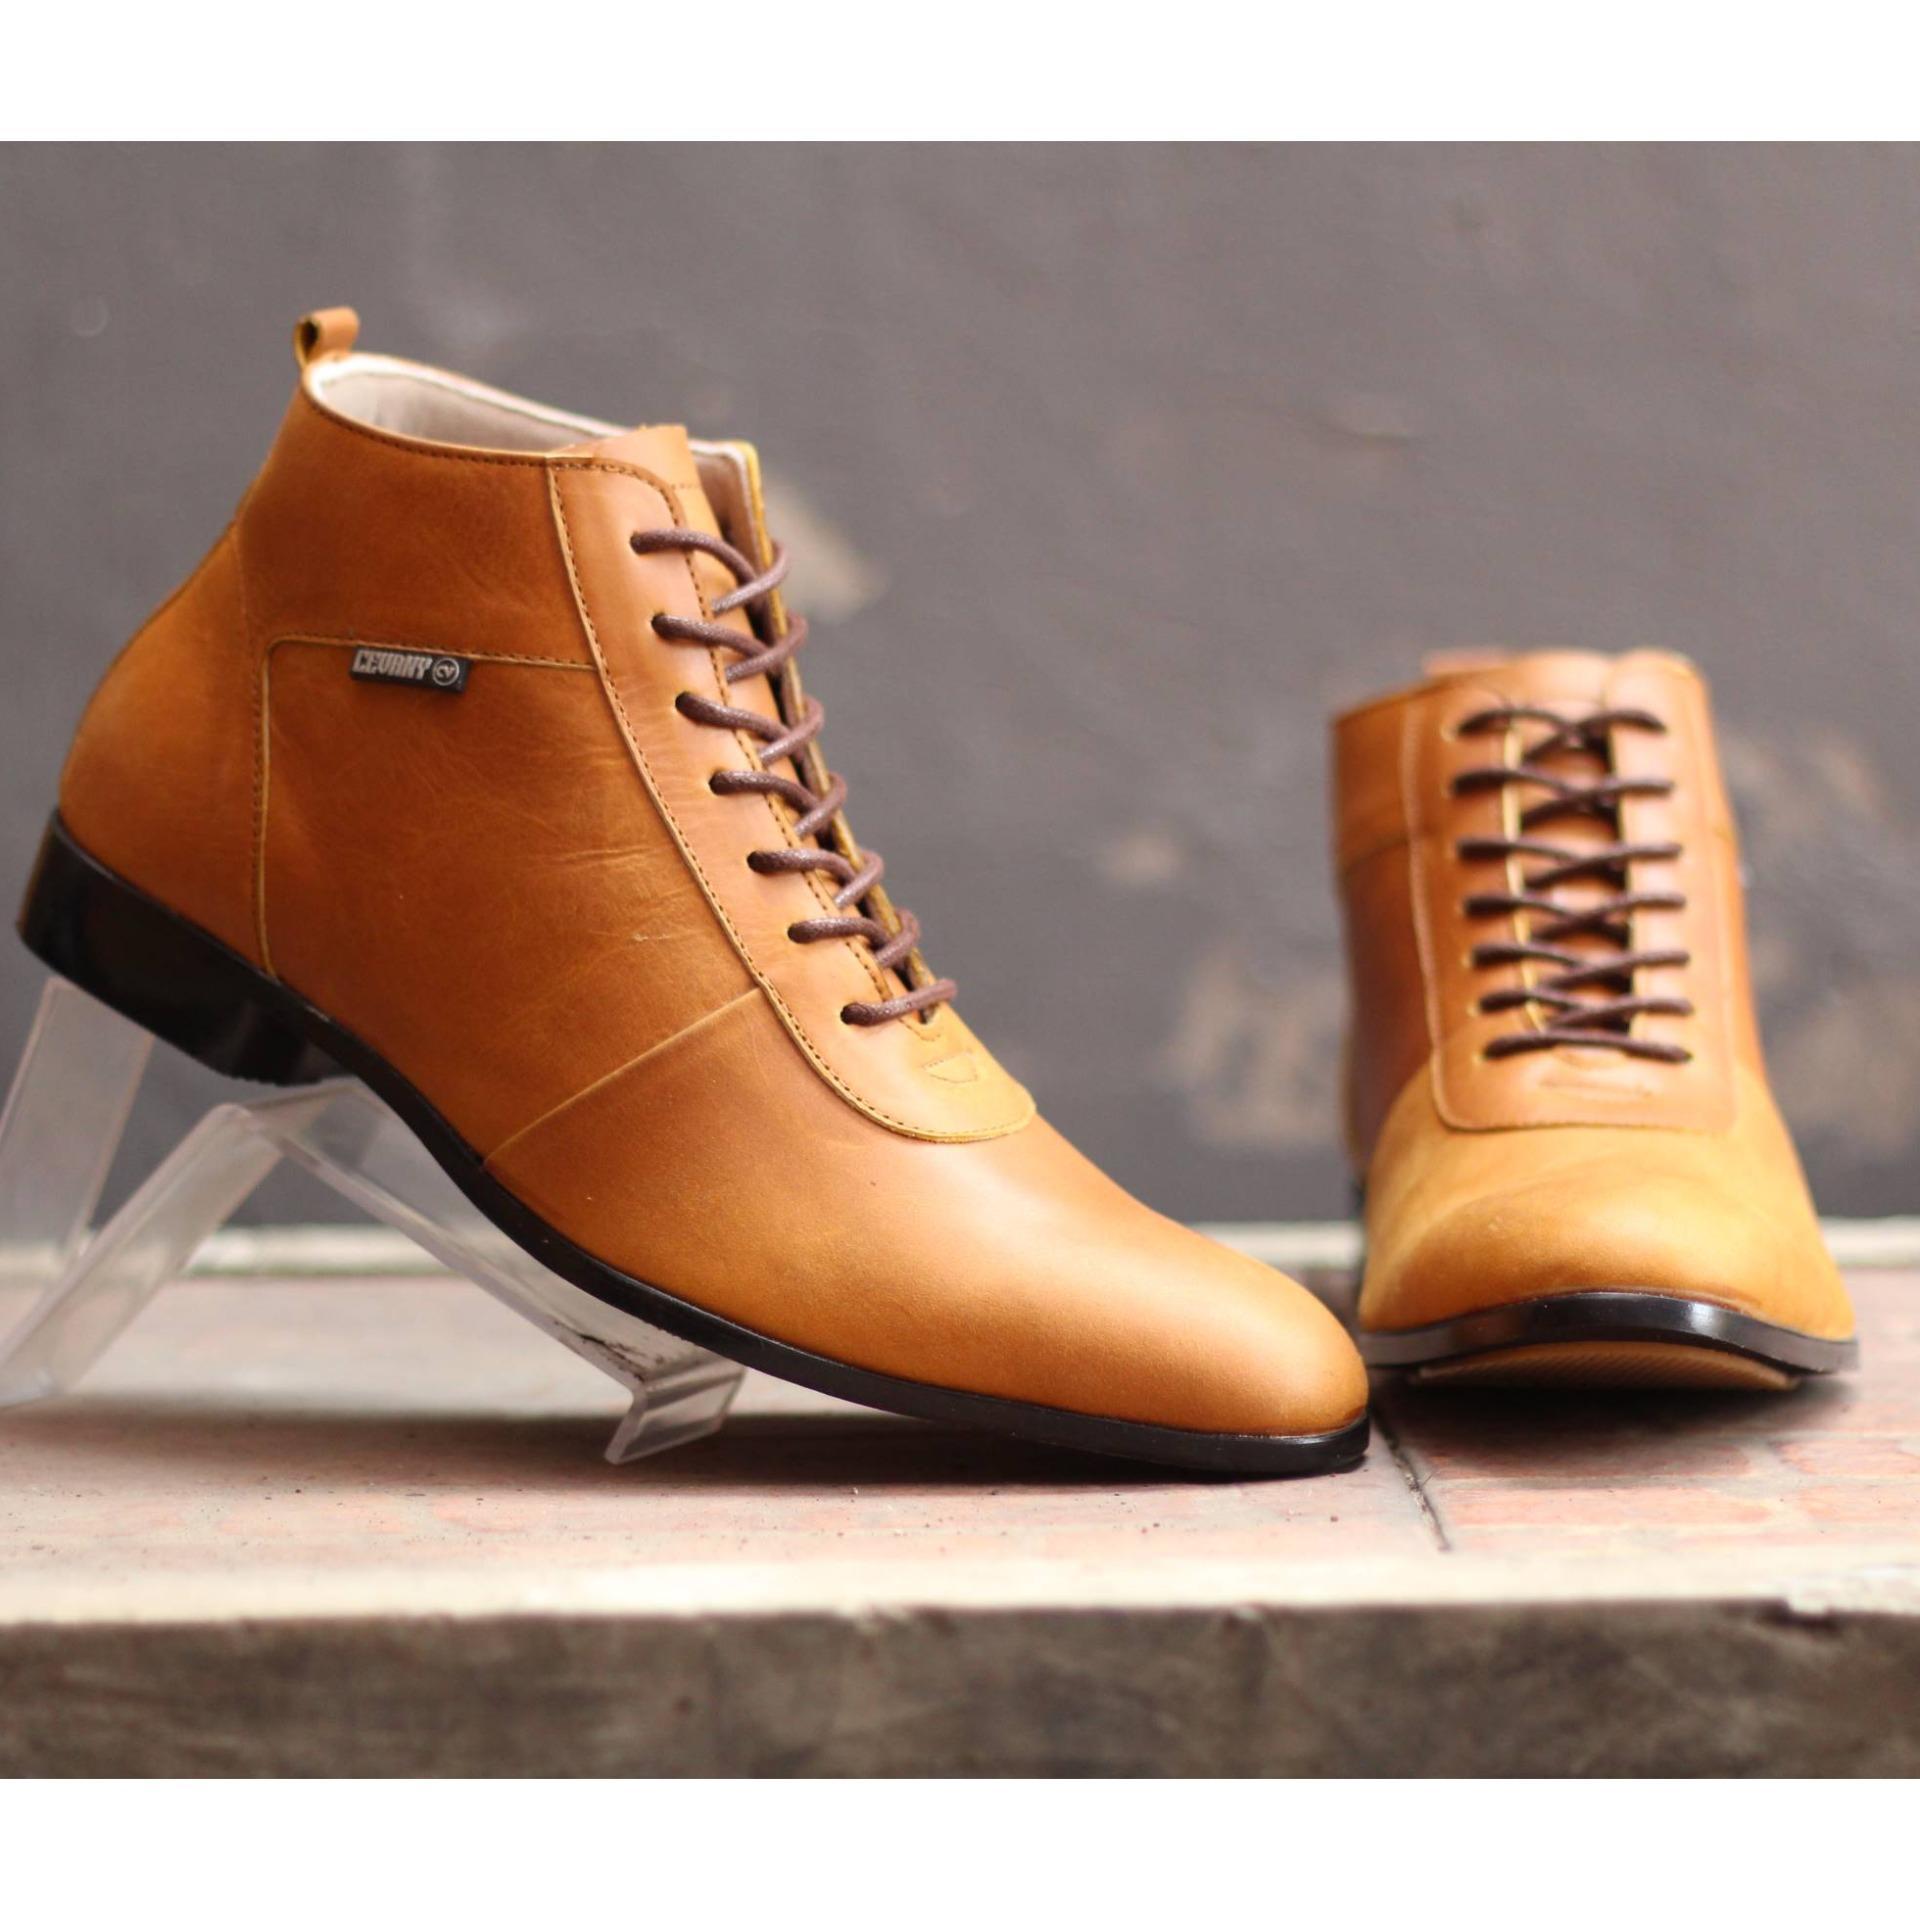 Sepatu Boot Cevany Brodo Max Kulit Sapi Asli